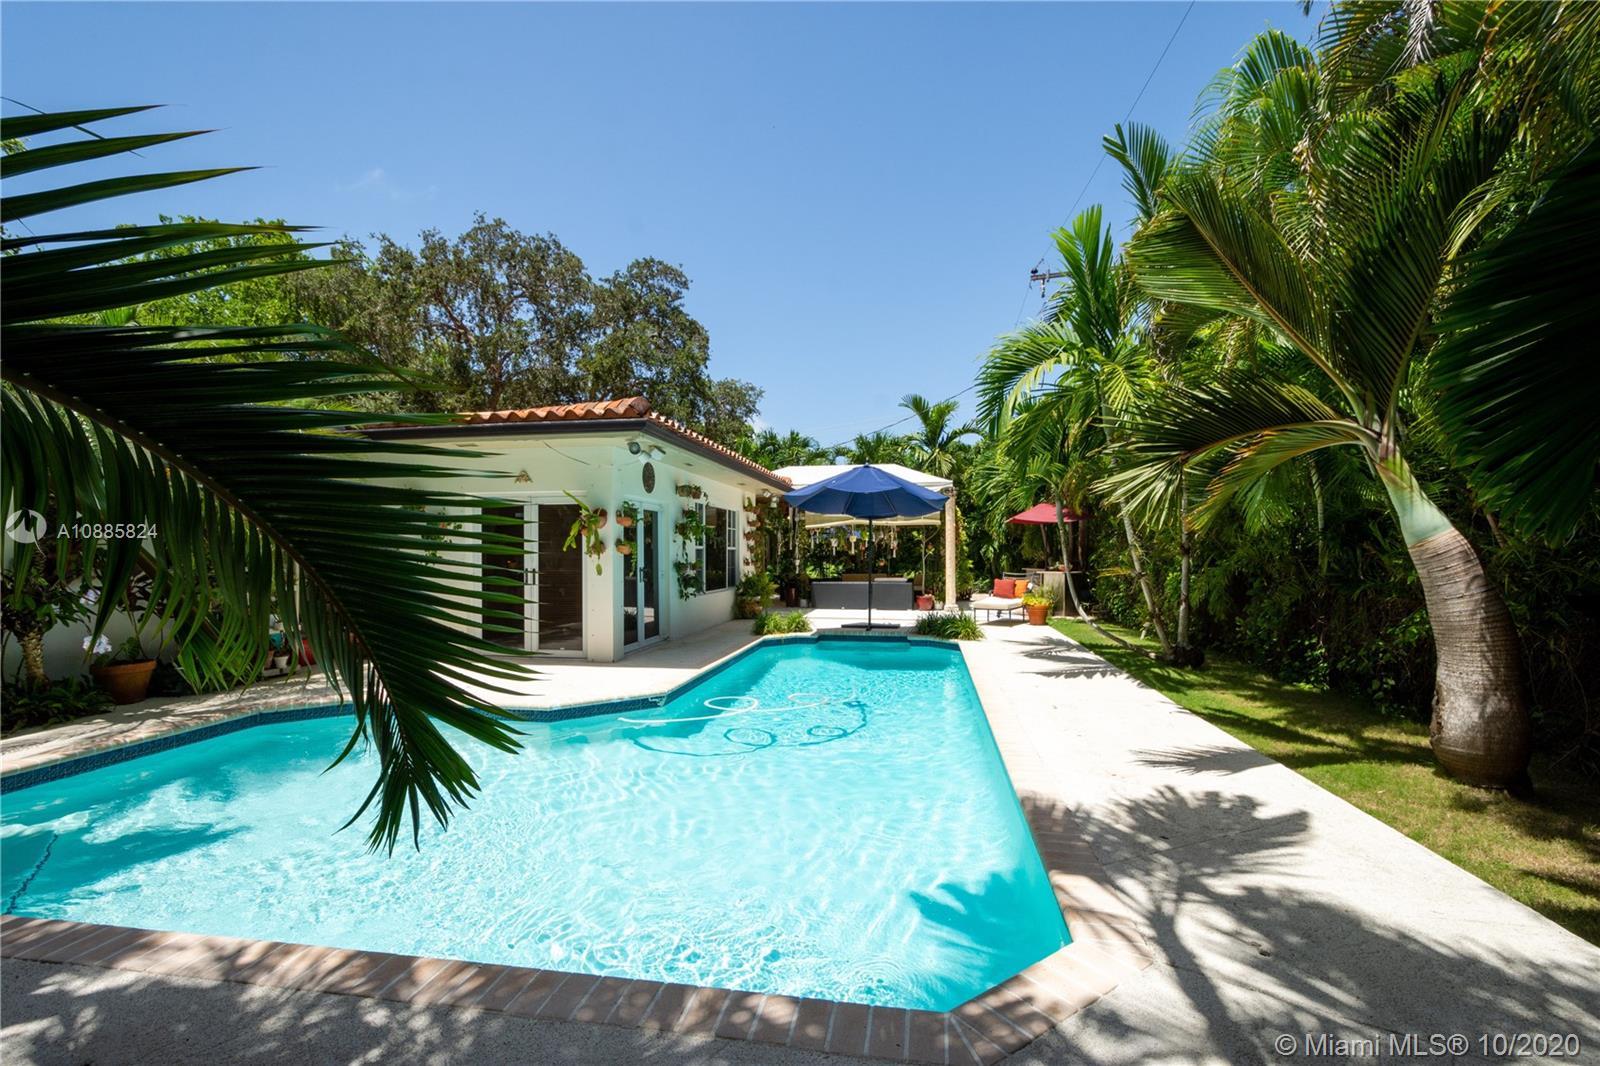 1025 S Bayamo Ave  For Sale A10885824, FL